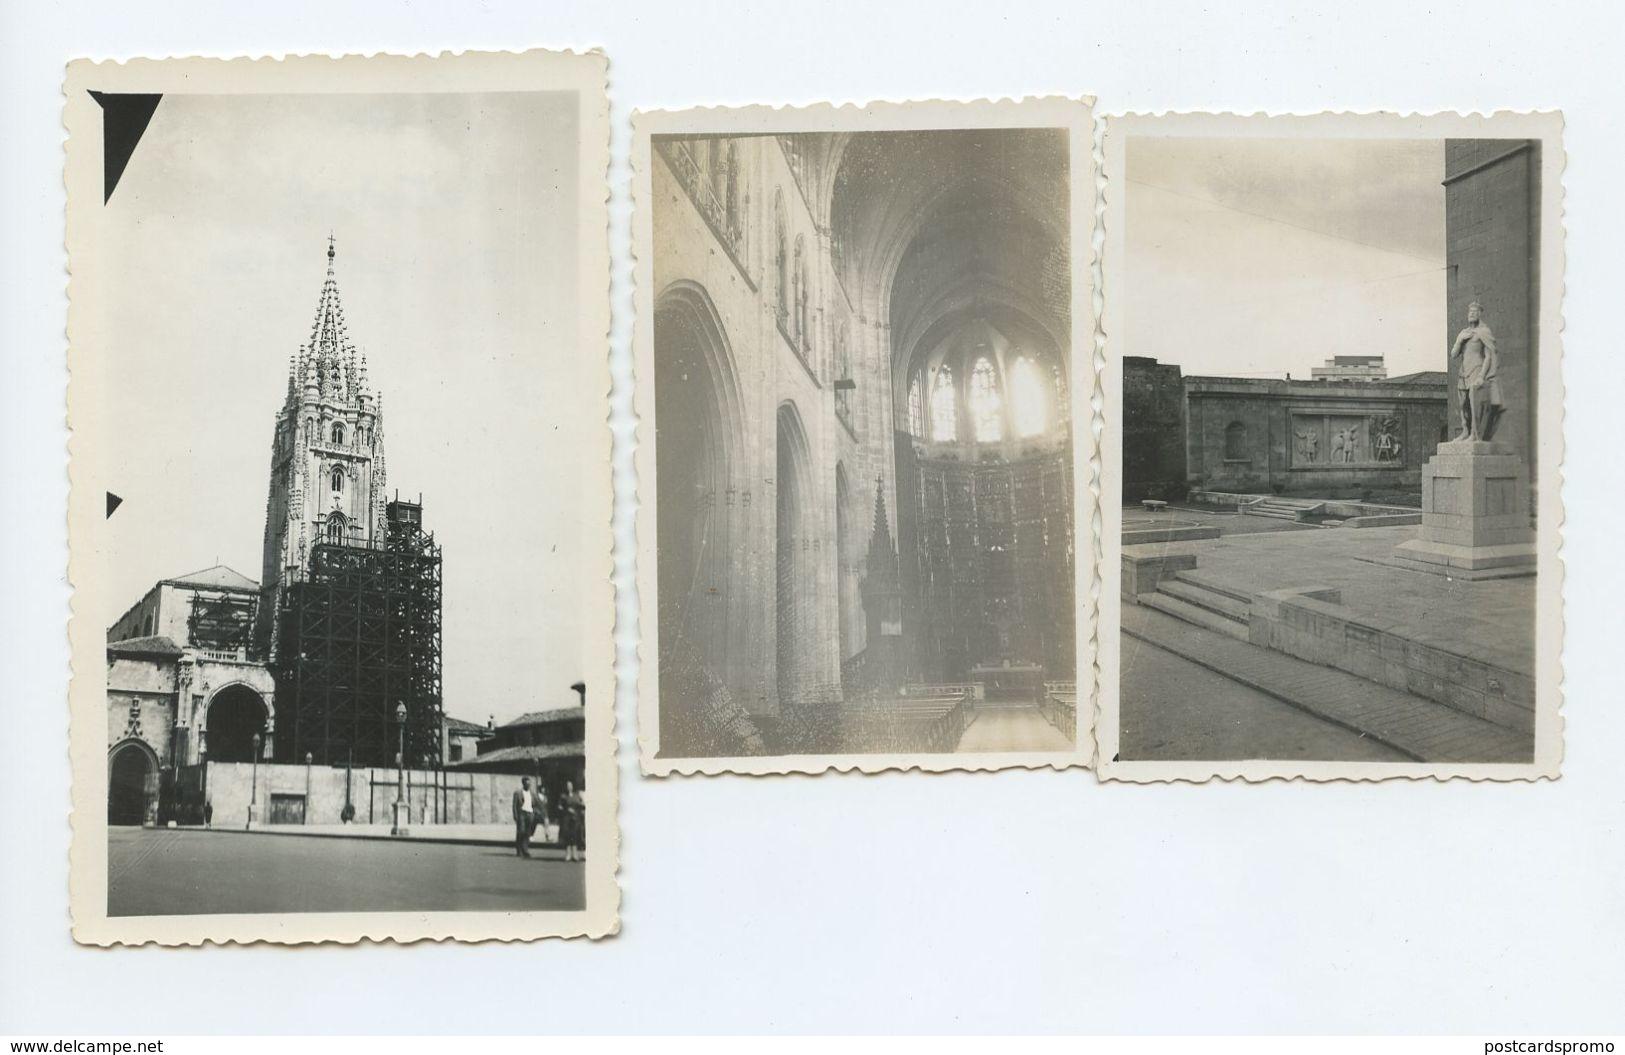 Spain, OVIEDO, 3 Real Photo 1951, Catedral , Estatua De Pelayo  ( 2 Scans ) - Luoghi